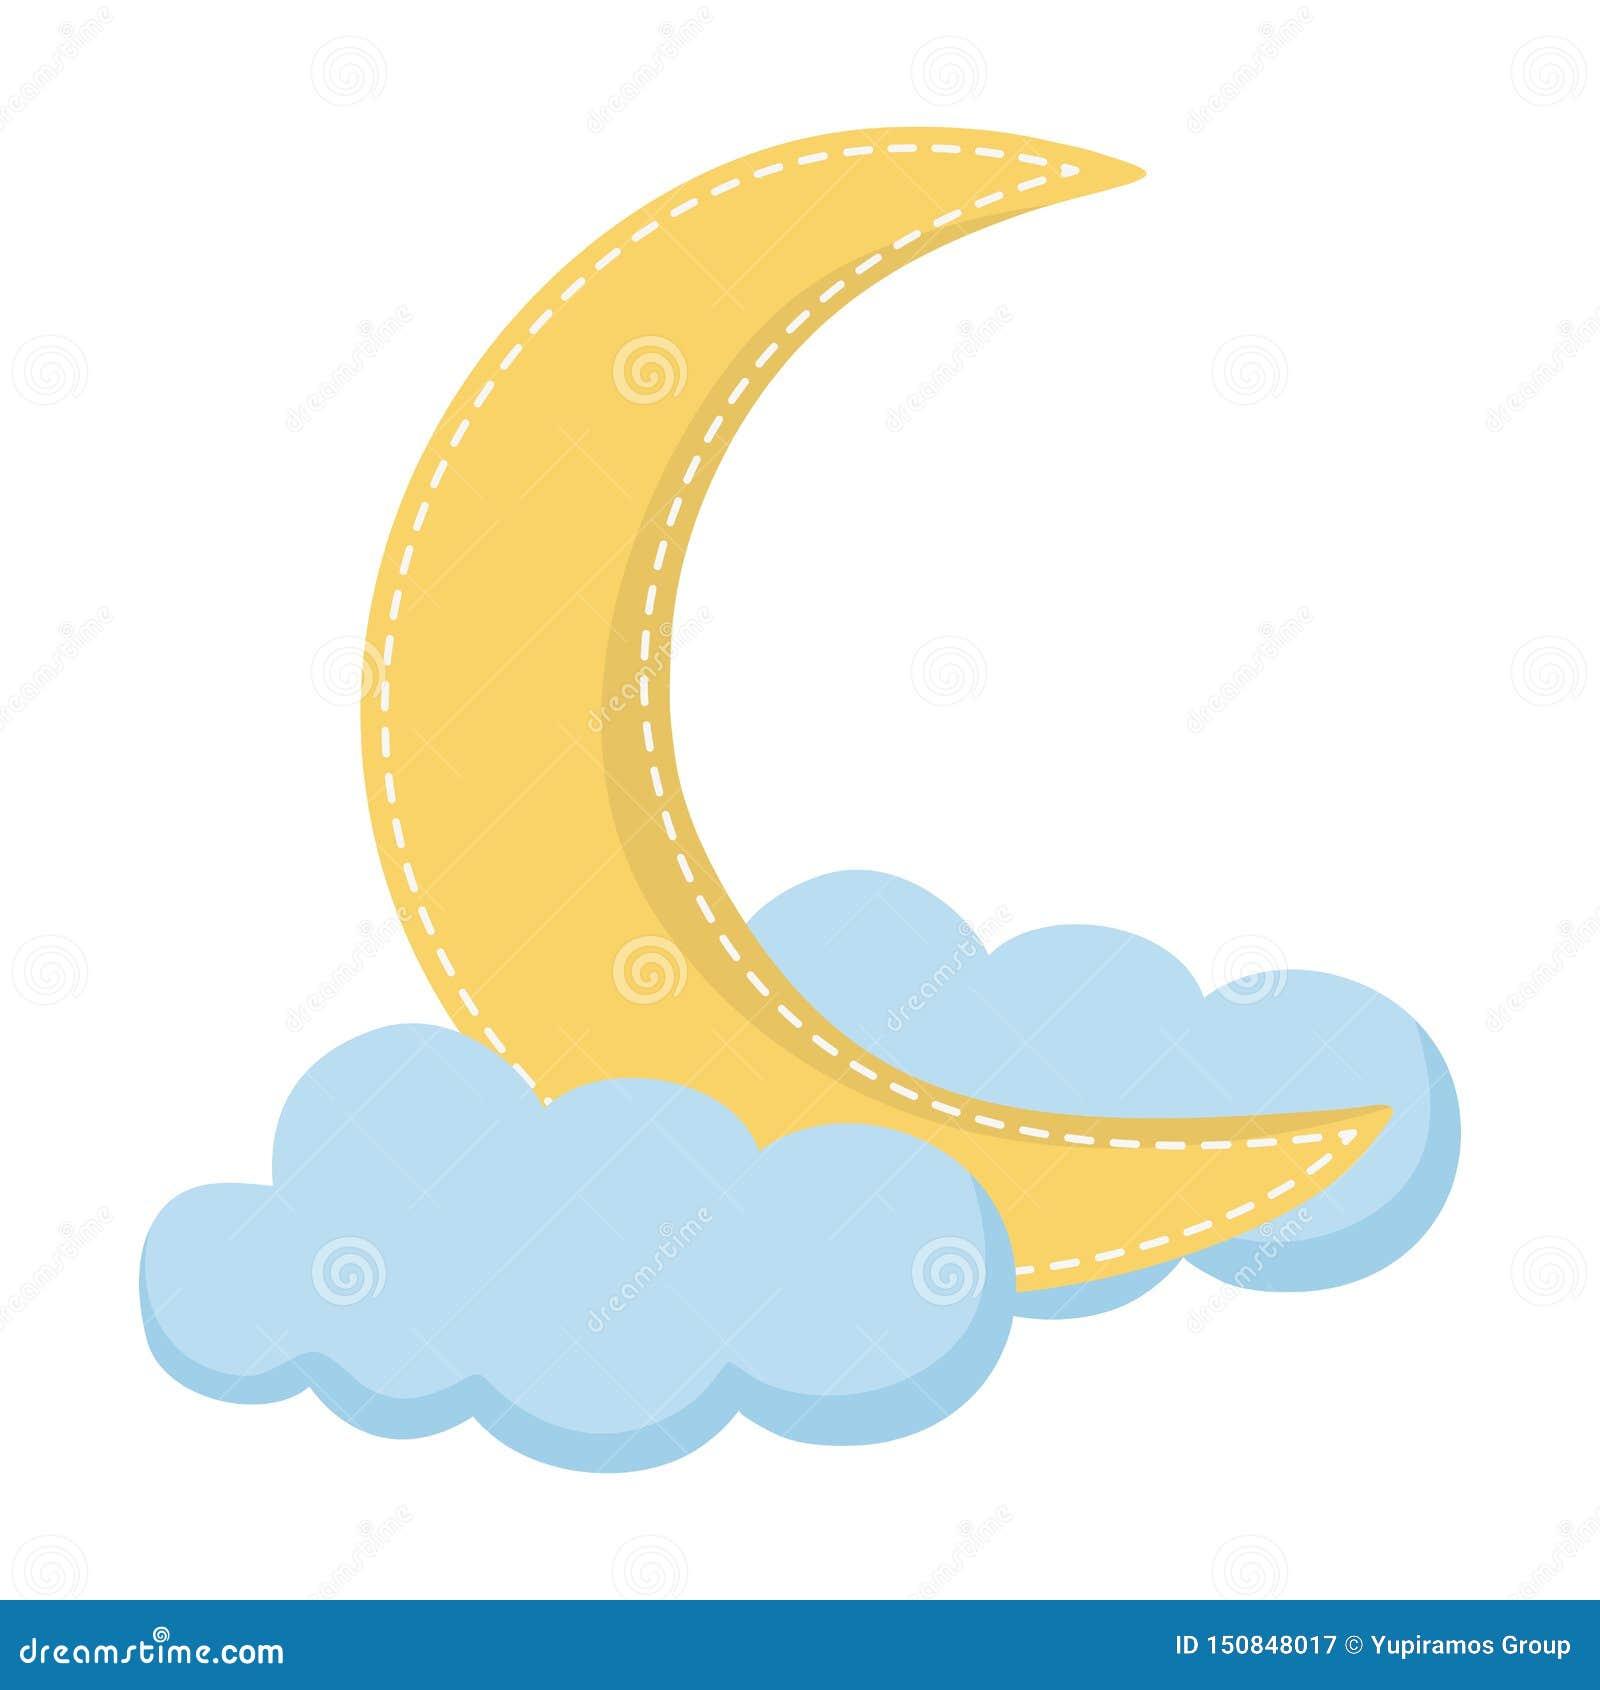 Cute moon design vector illustration